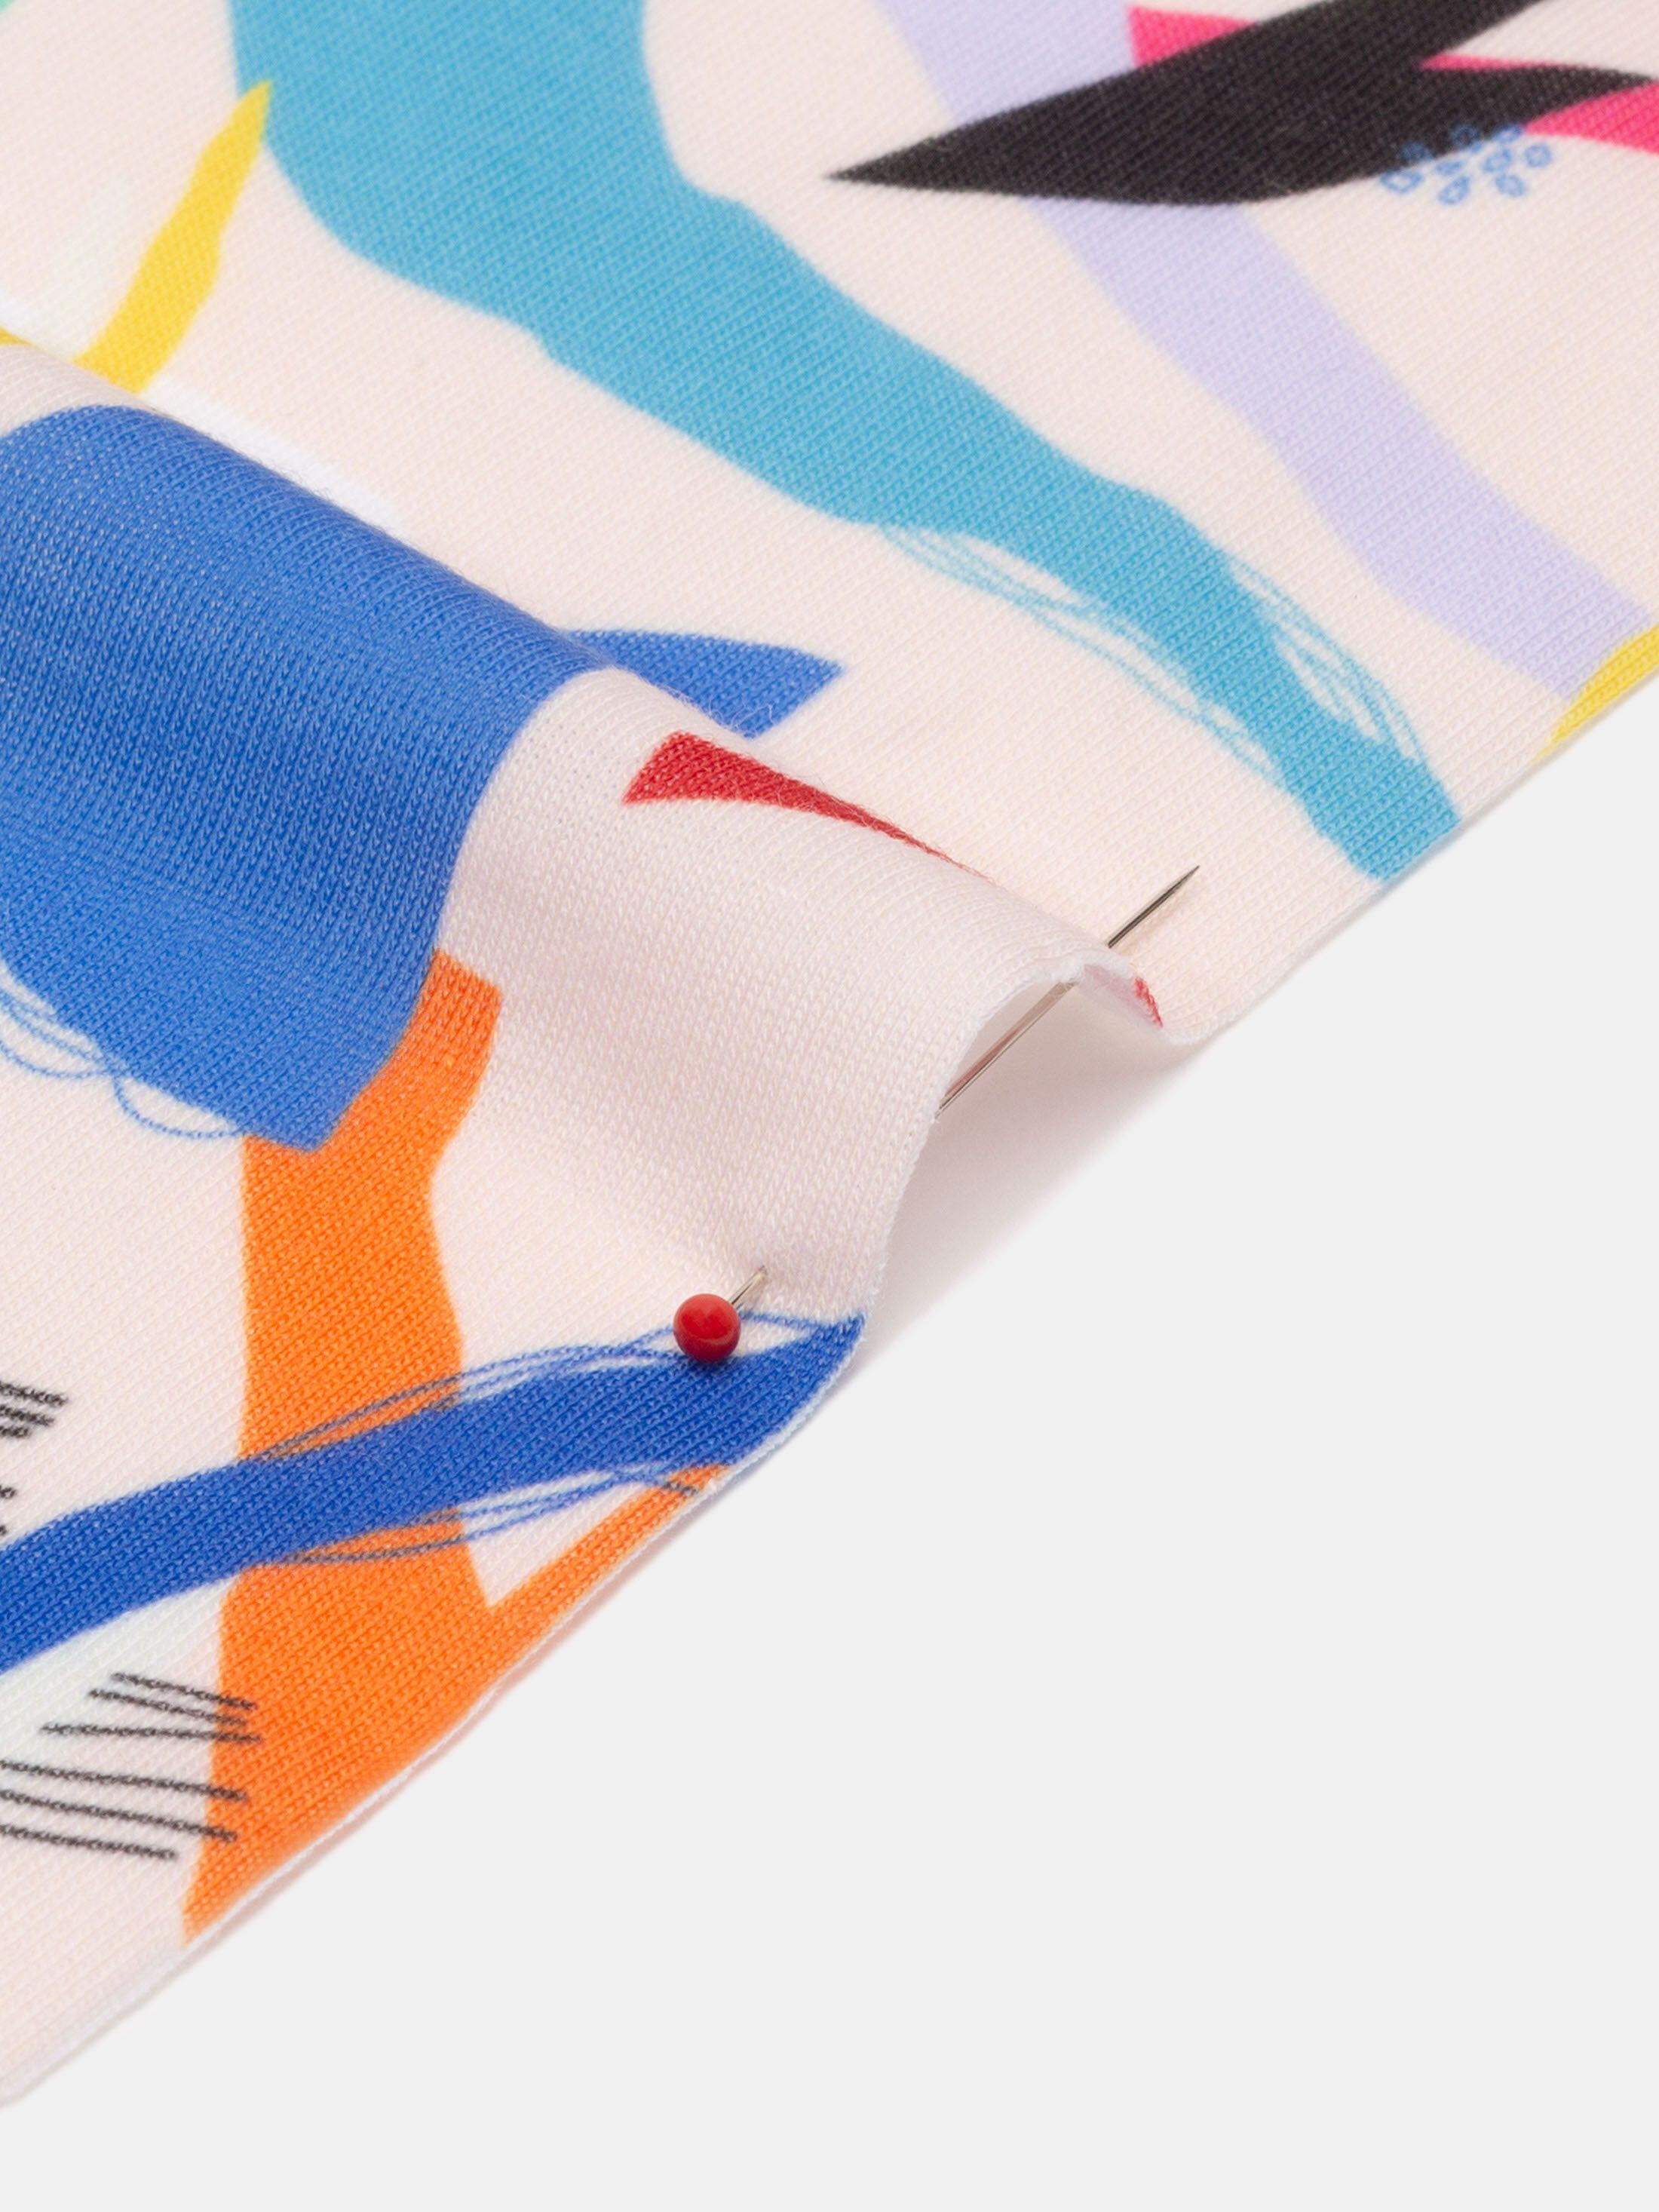 custom jersey stretch fabric printing